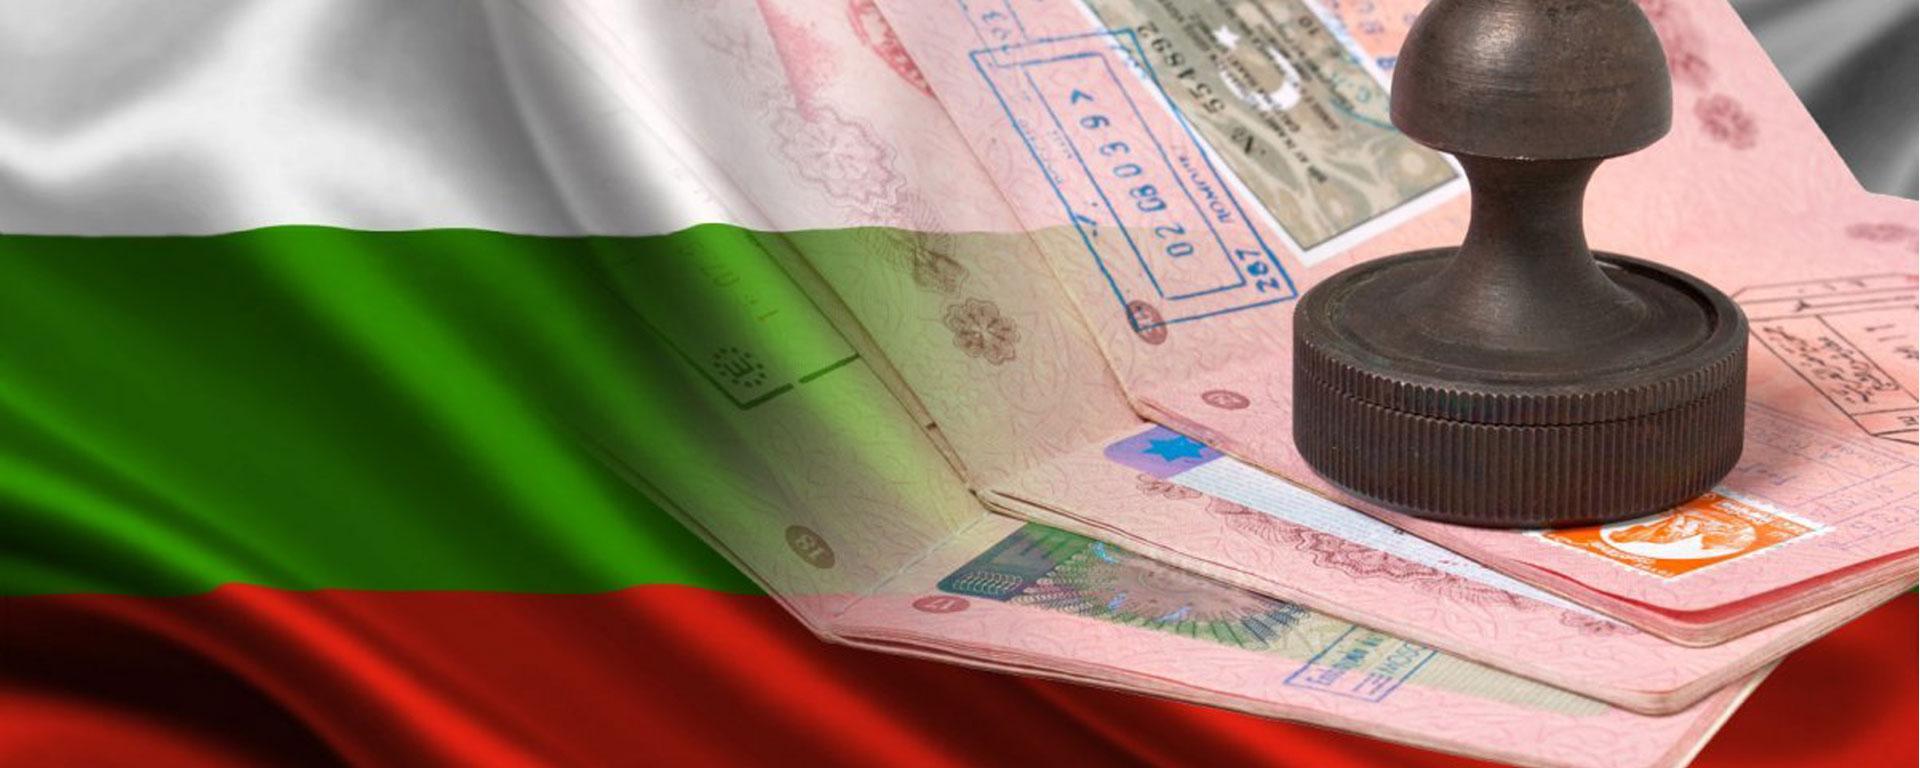 Лишение иностранца права на пребывание в Болгарии